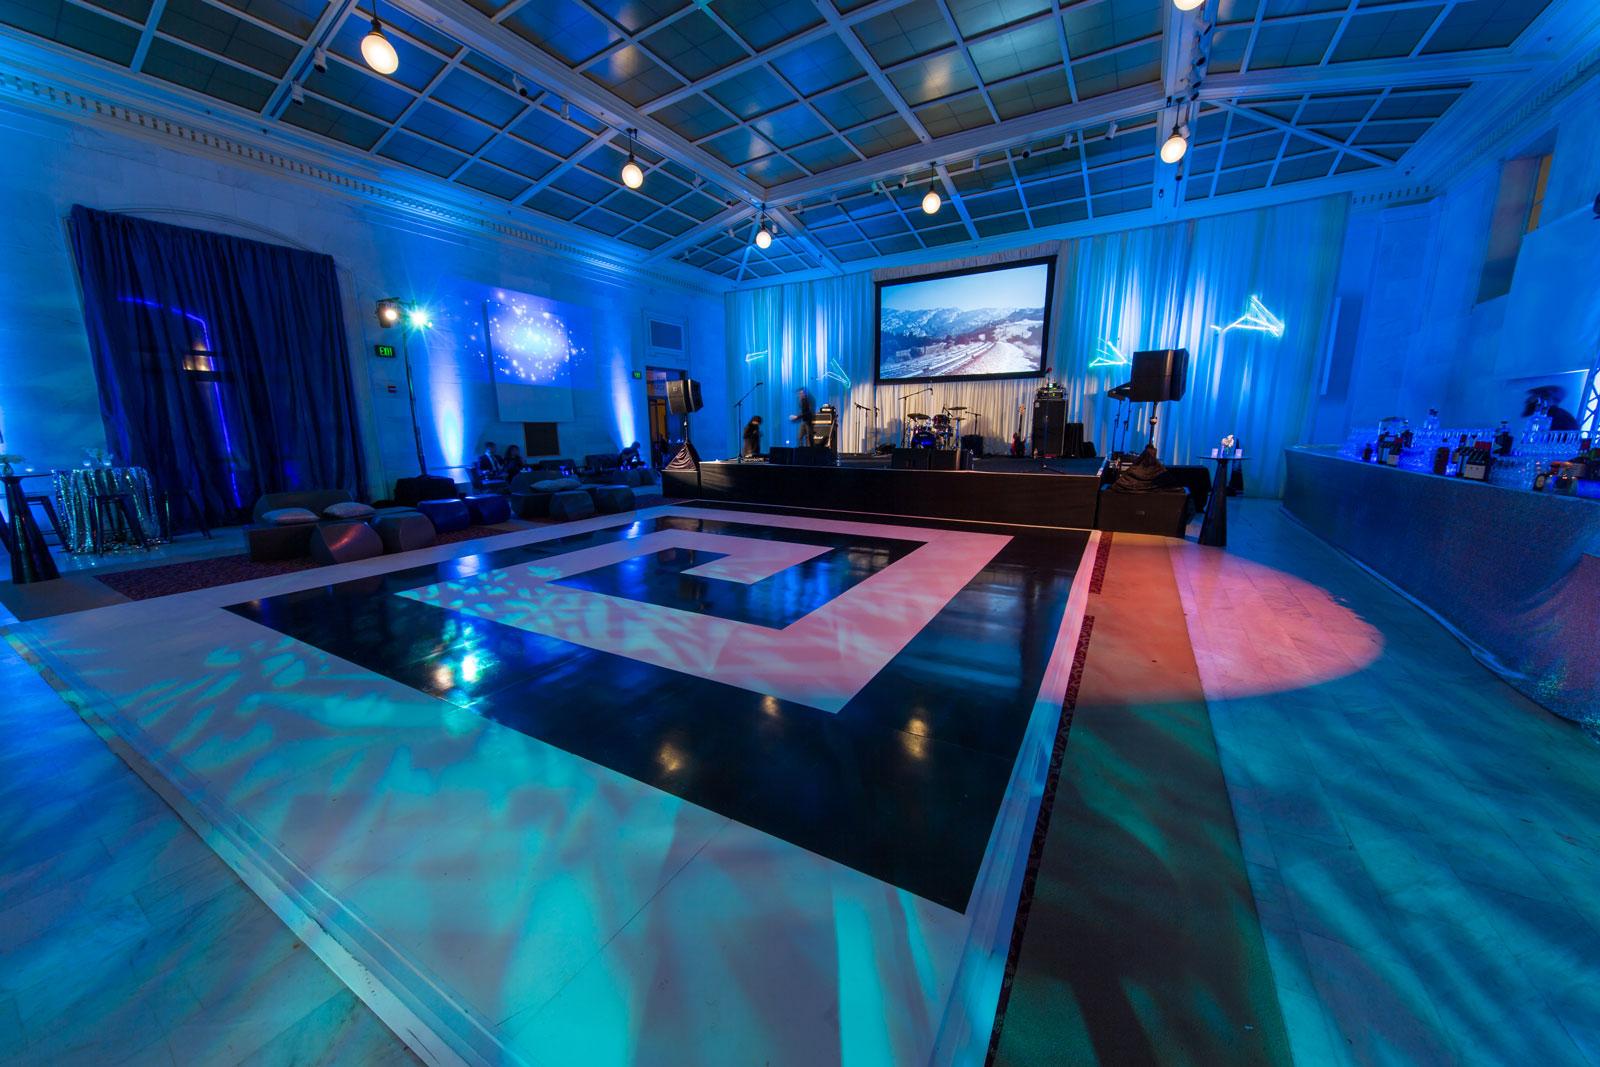 everything-audio-visual-venues-city-hall-13.jpg